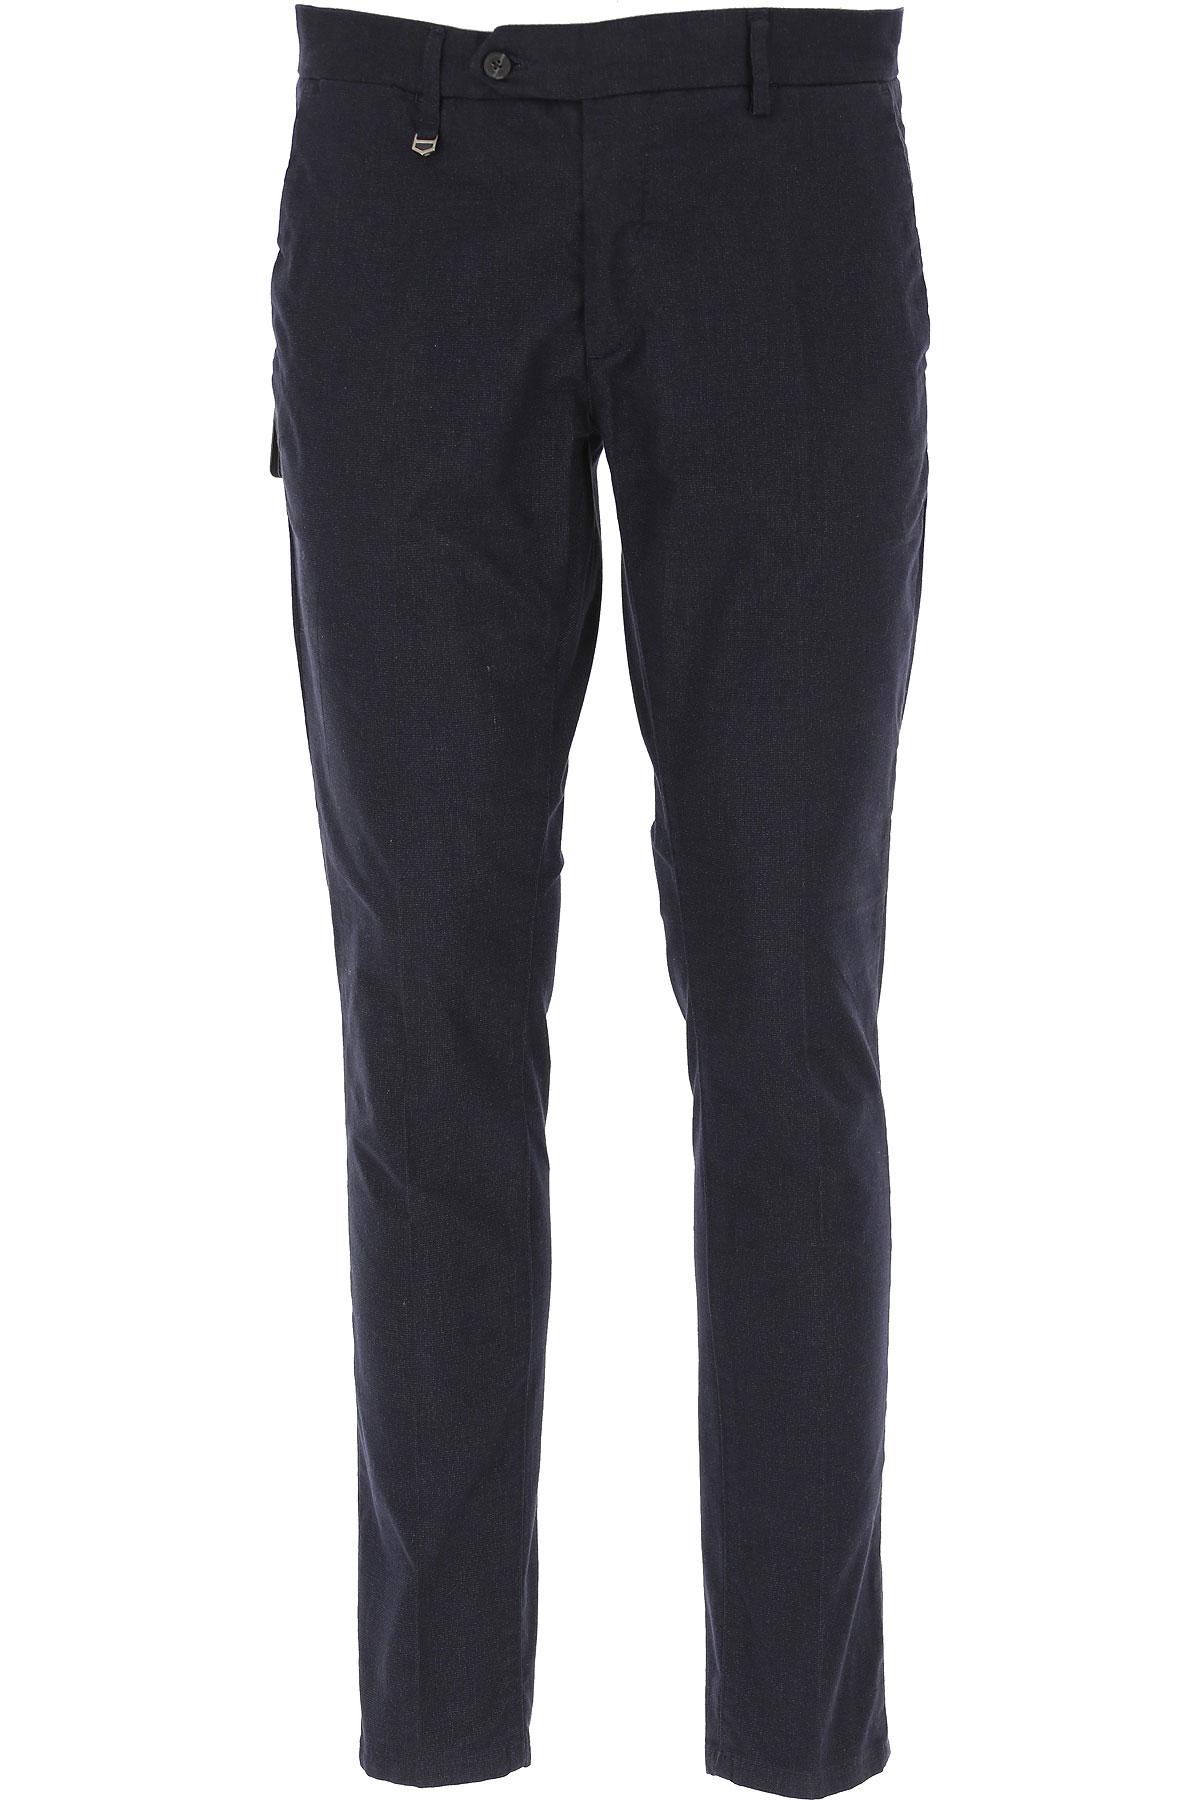 Antony Morato Jeans On Sale, Dark Blue, Cotton, 2019, 30 32 34 36 38